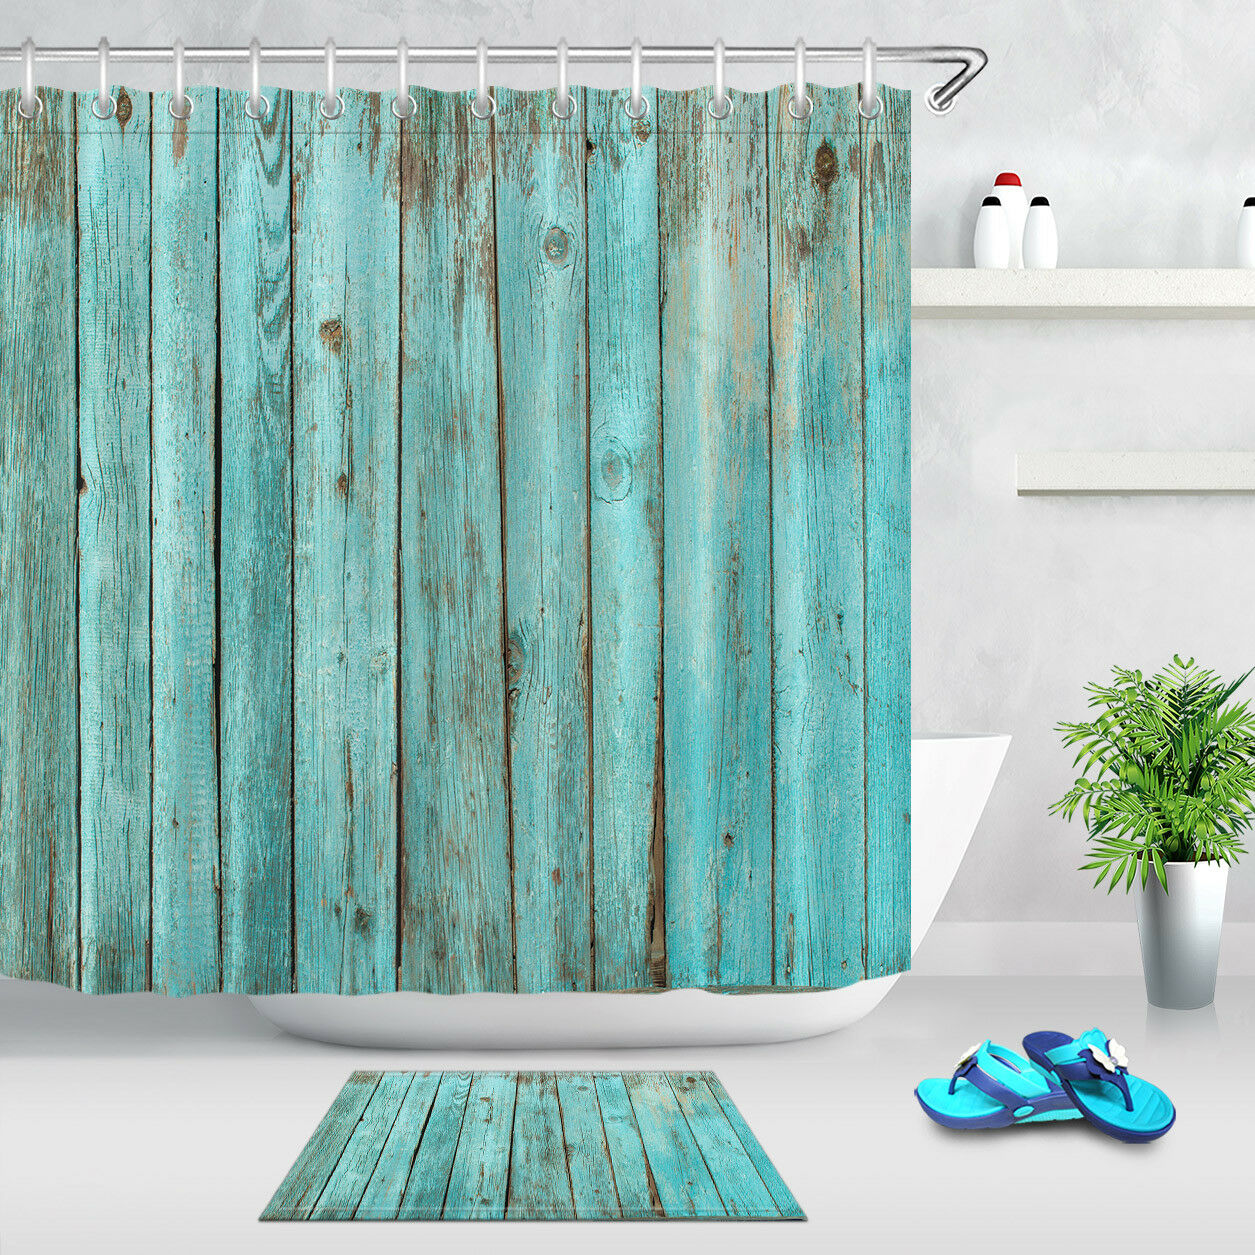 Details About Rustic Wood Panel Blue Shower Curtain Waterproof Shower Curtain Fabric Bath Mat